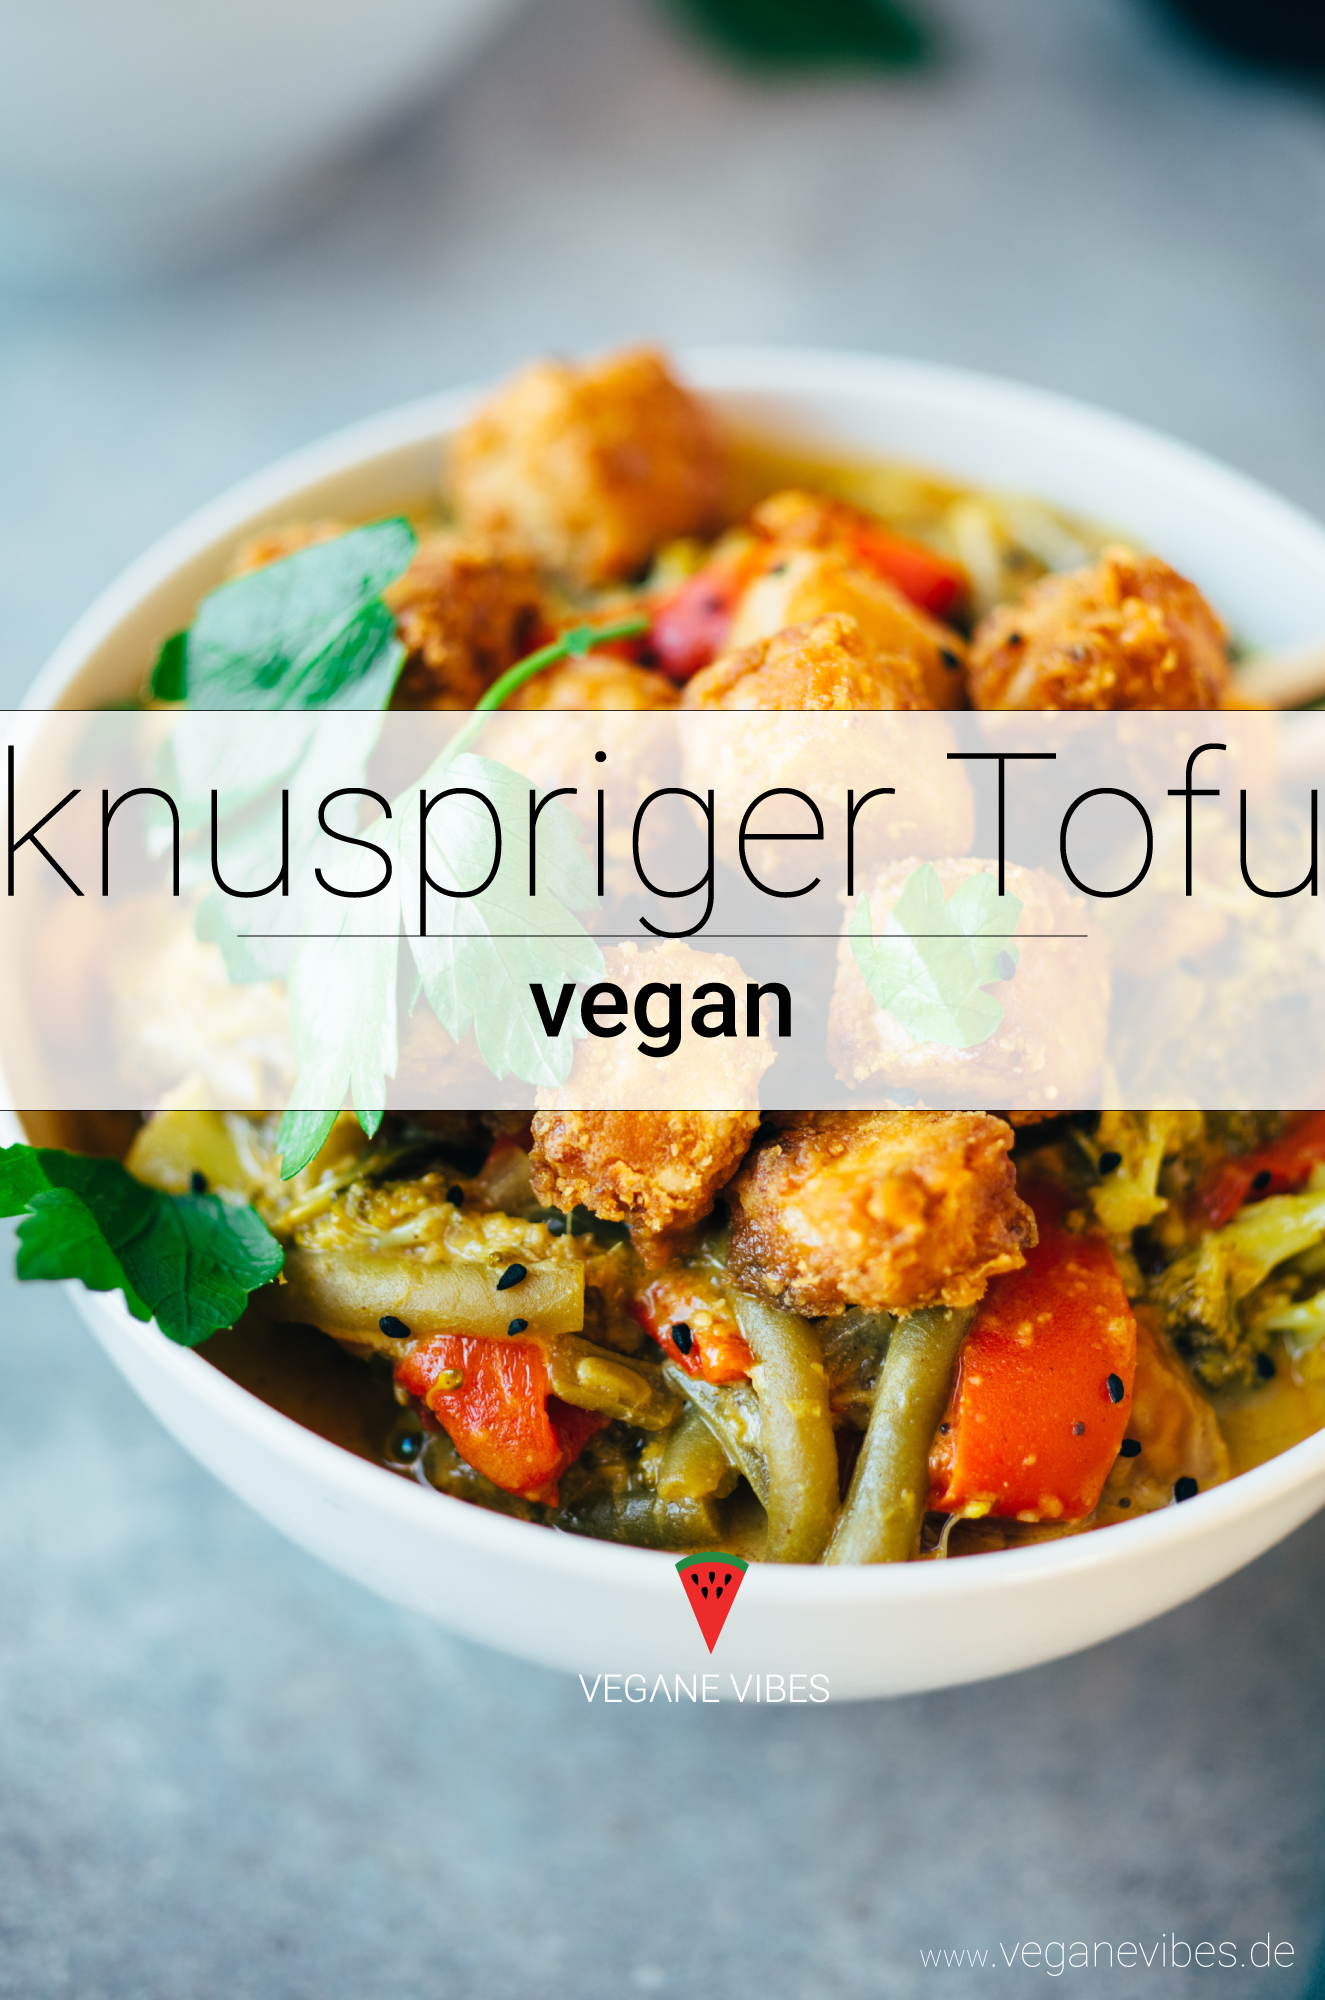 Knuspriger Tofu (asian style)